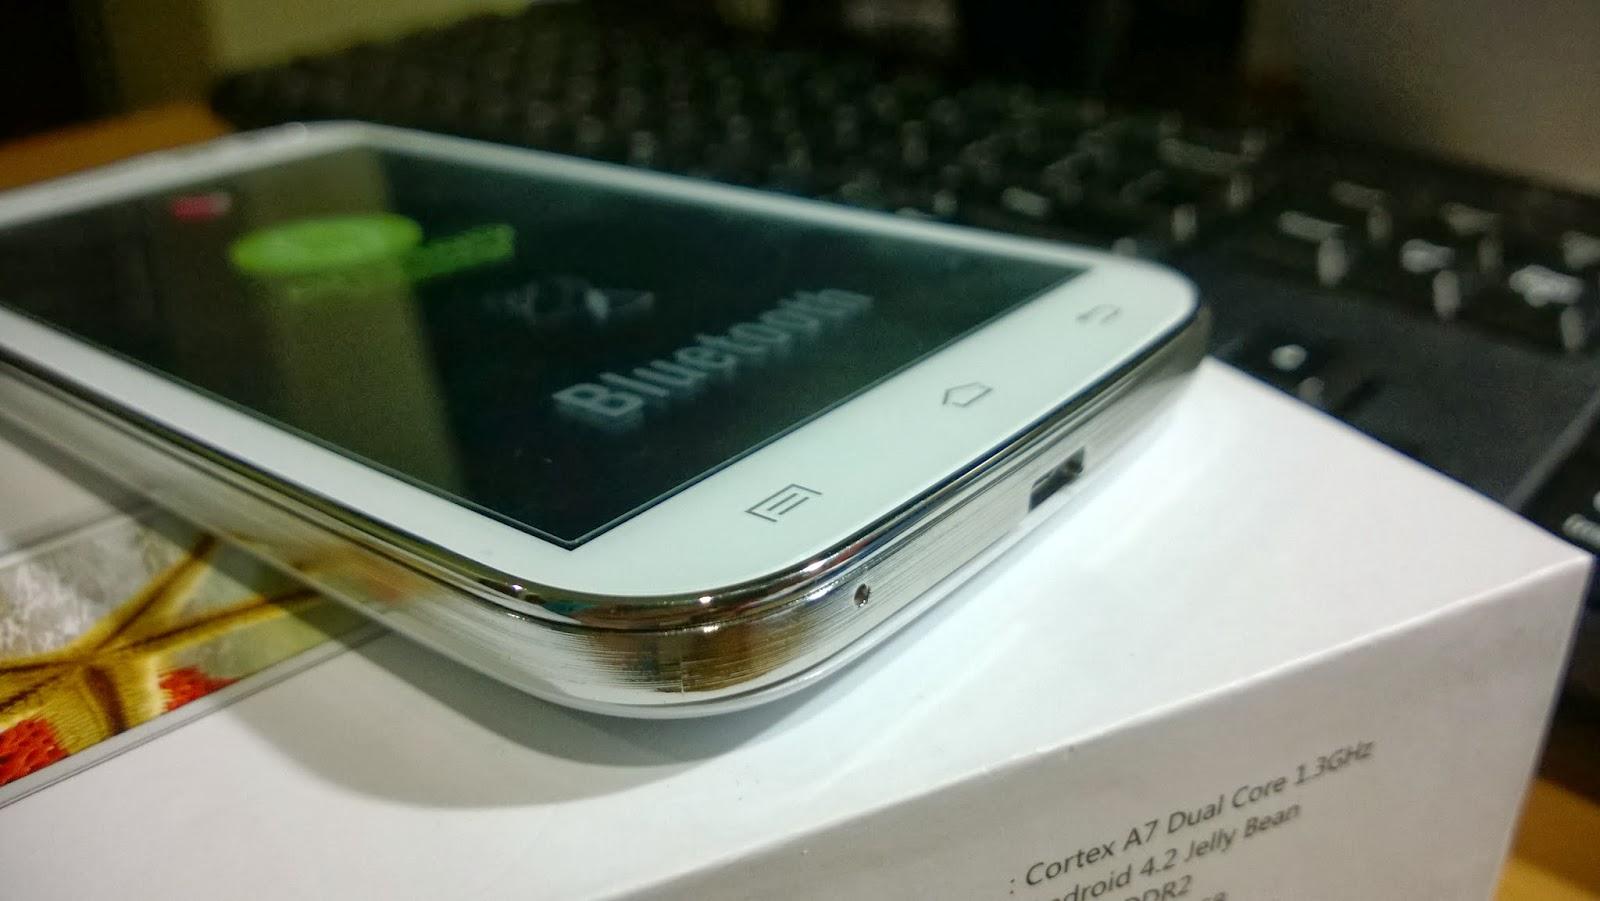 Inilah ponsel android dari advan bernama quot advan vandroid s5e quot